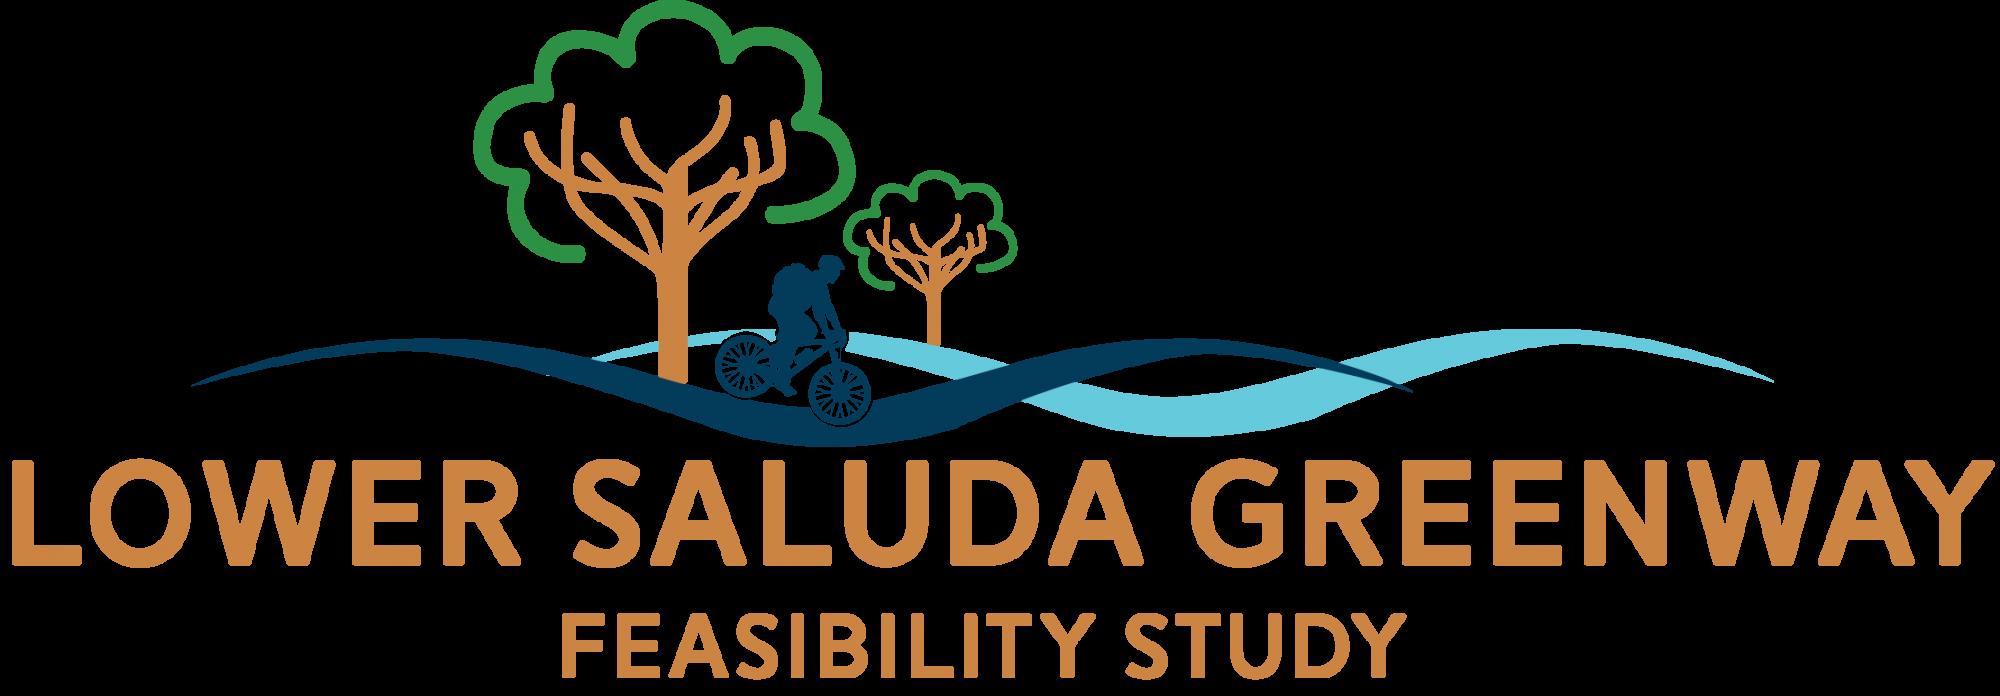 Lower Saluda Greenway Feasibility Study Topic of Lexington Chamber Breakfast Meeting